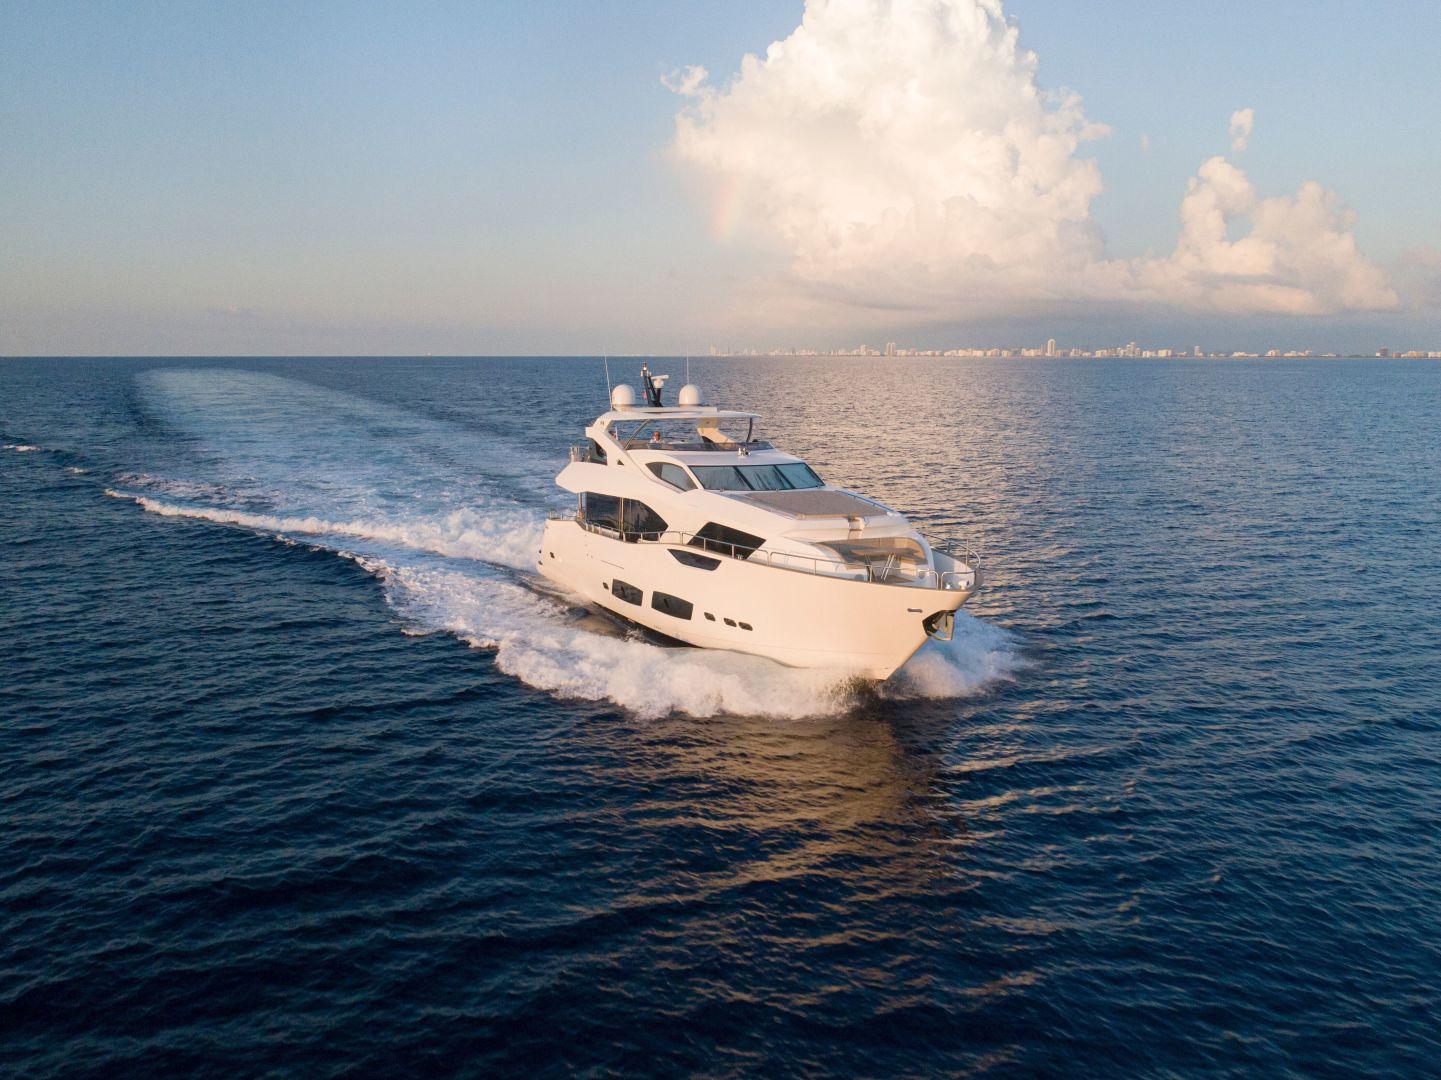 Sunseeker-95 Yacht 2017-Perseverance 3 Ft Lauderdale-Florida-United States-1400066   Thumbnail